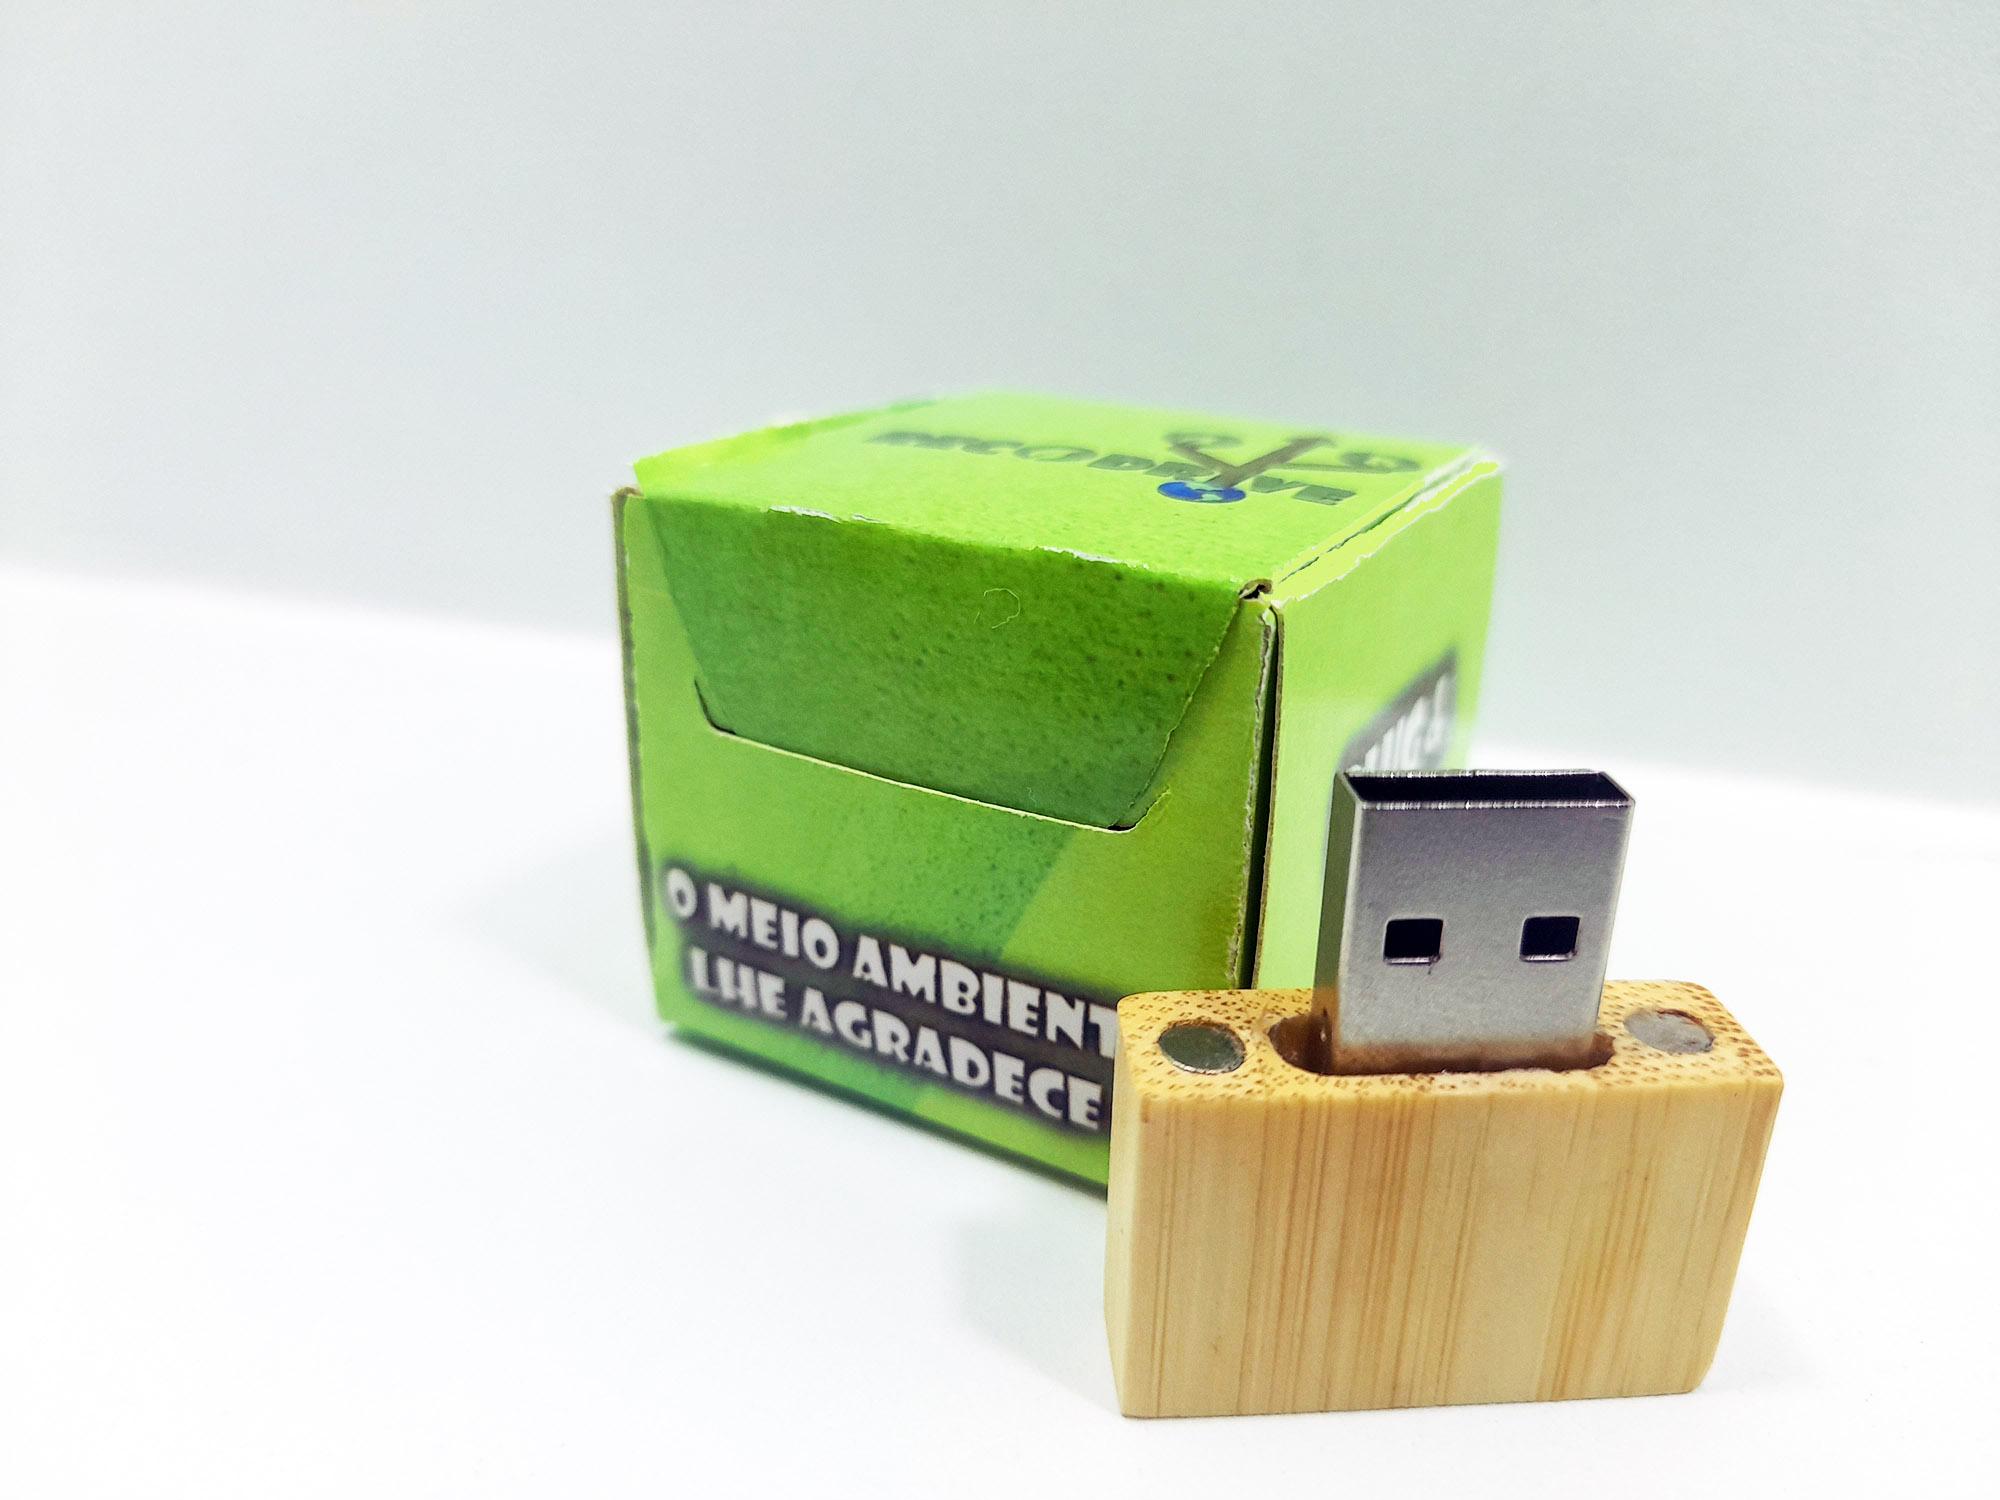 Linha rECOdrive - Pendrives Ecologicos Sustentáveis - Fit Classic 8 GB e 16 GB - Exclusivo